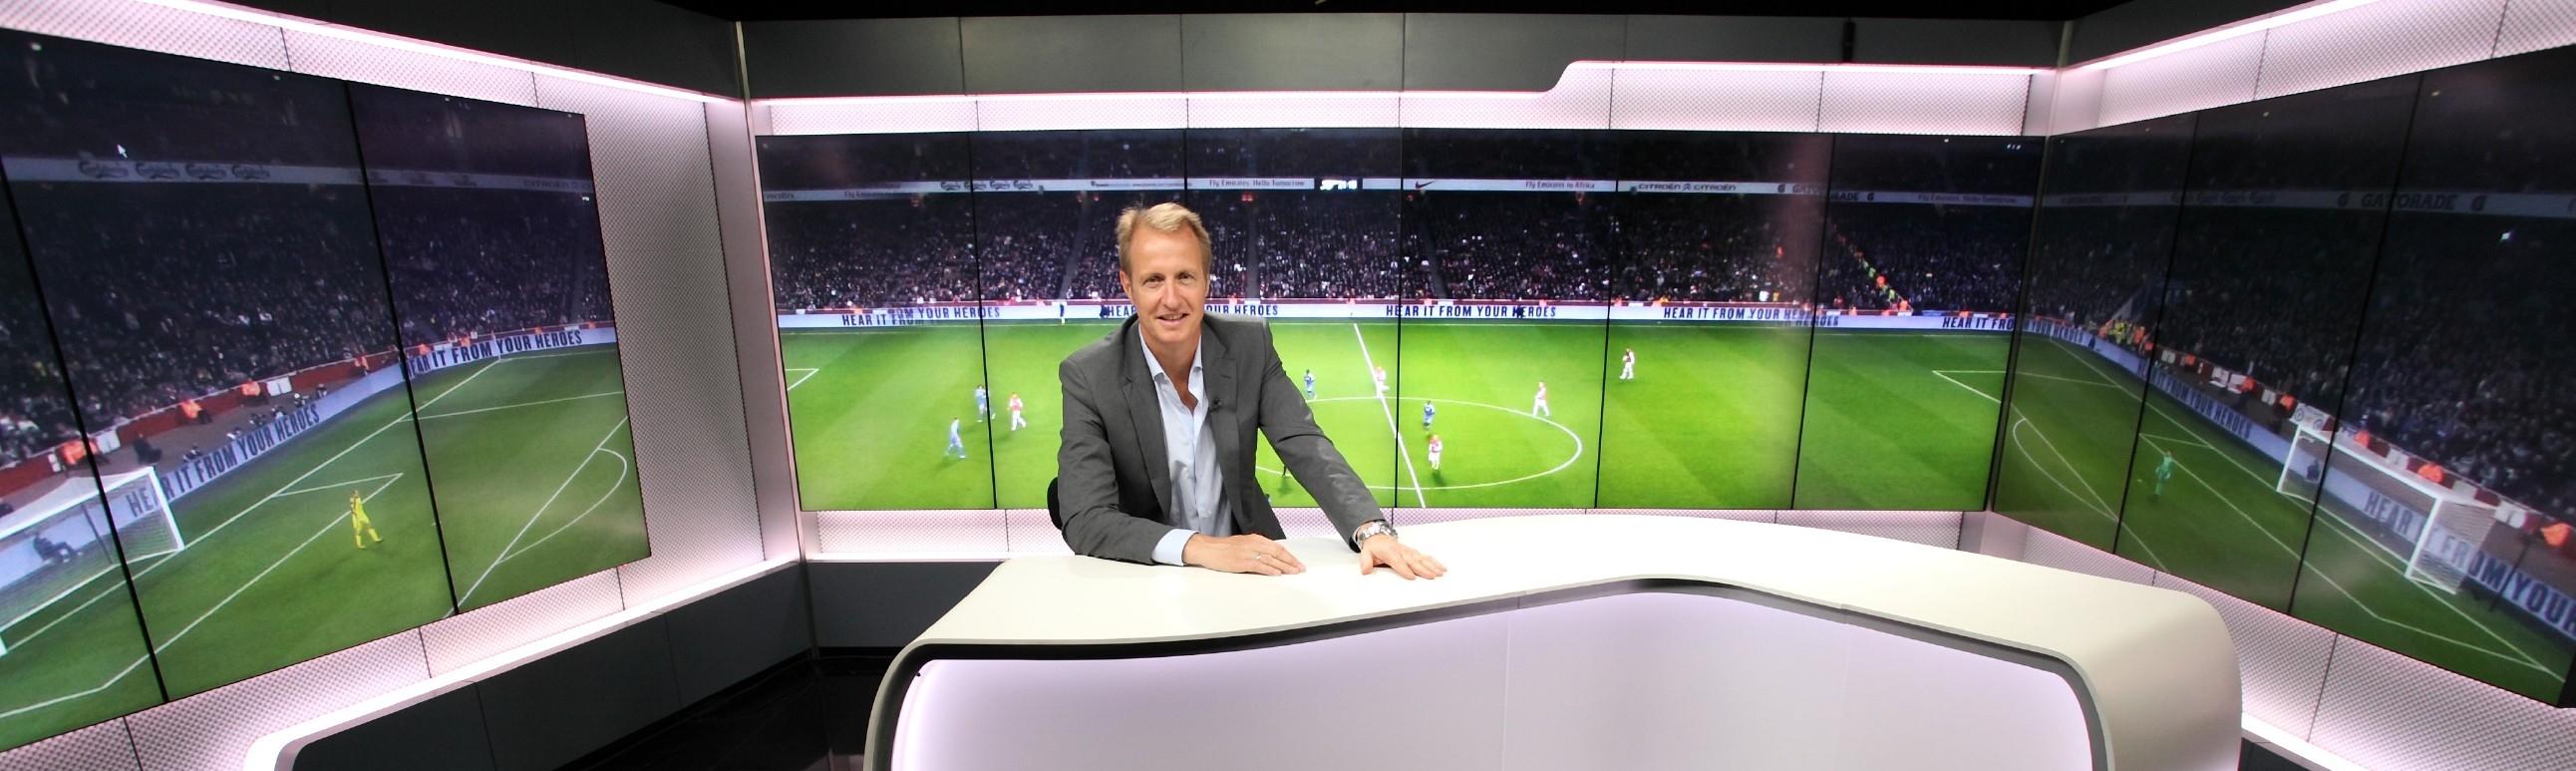 European Qualifiers RTL Fußball EM Qualifikation Florian König